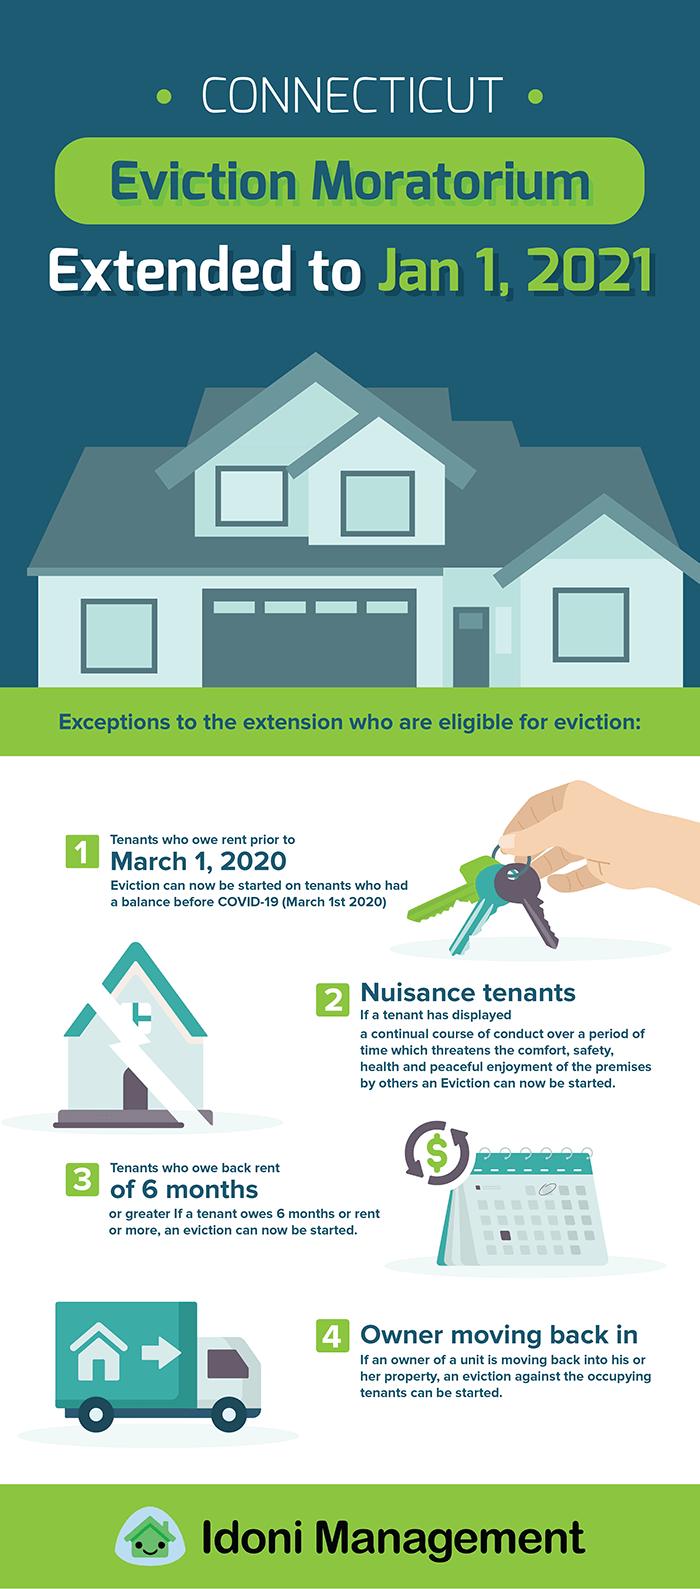 Connecticut eviction moratorium